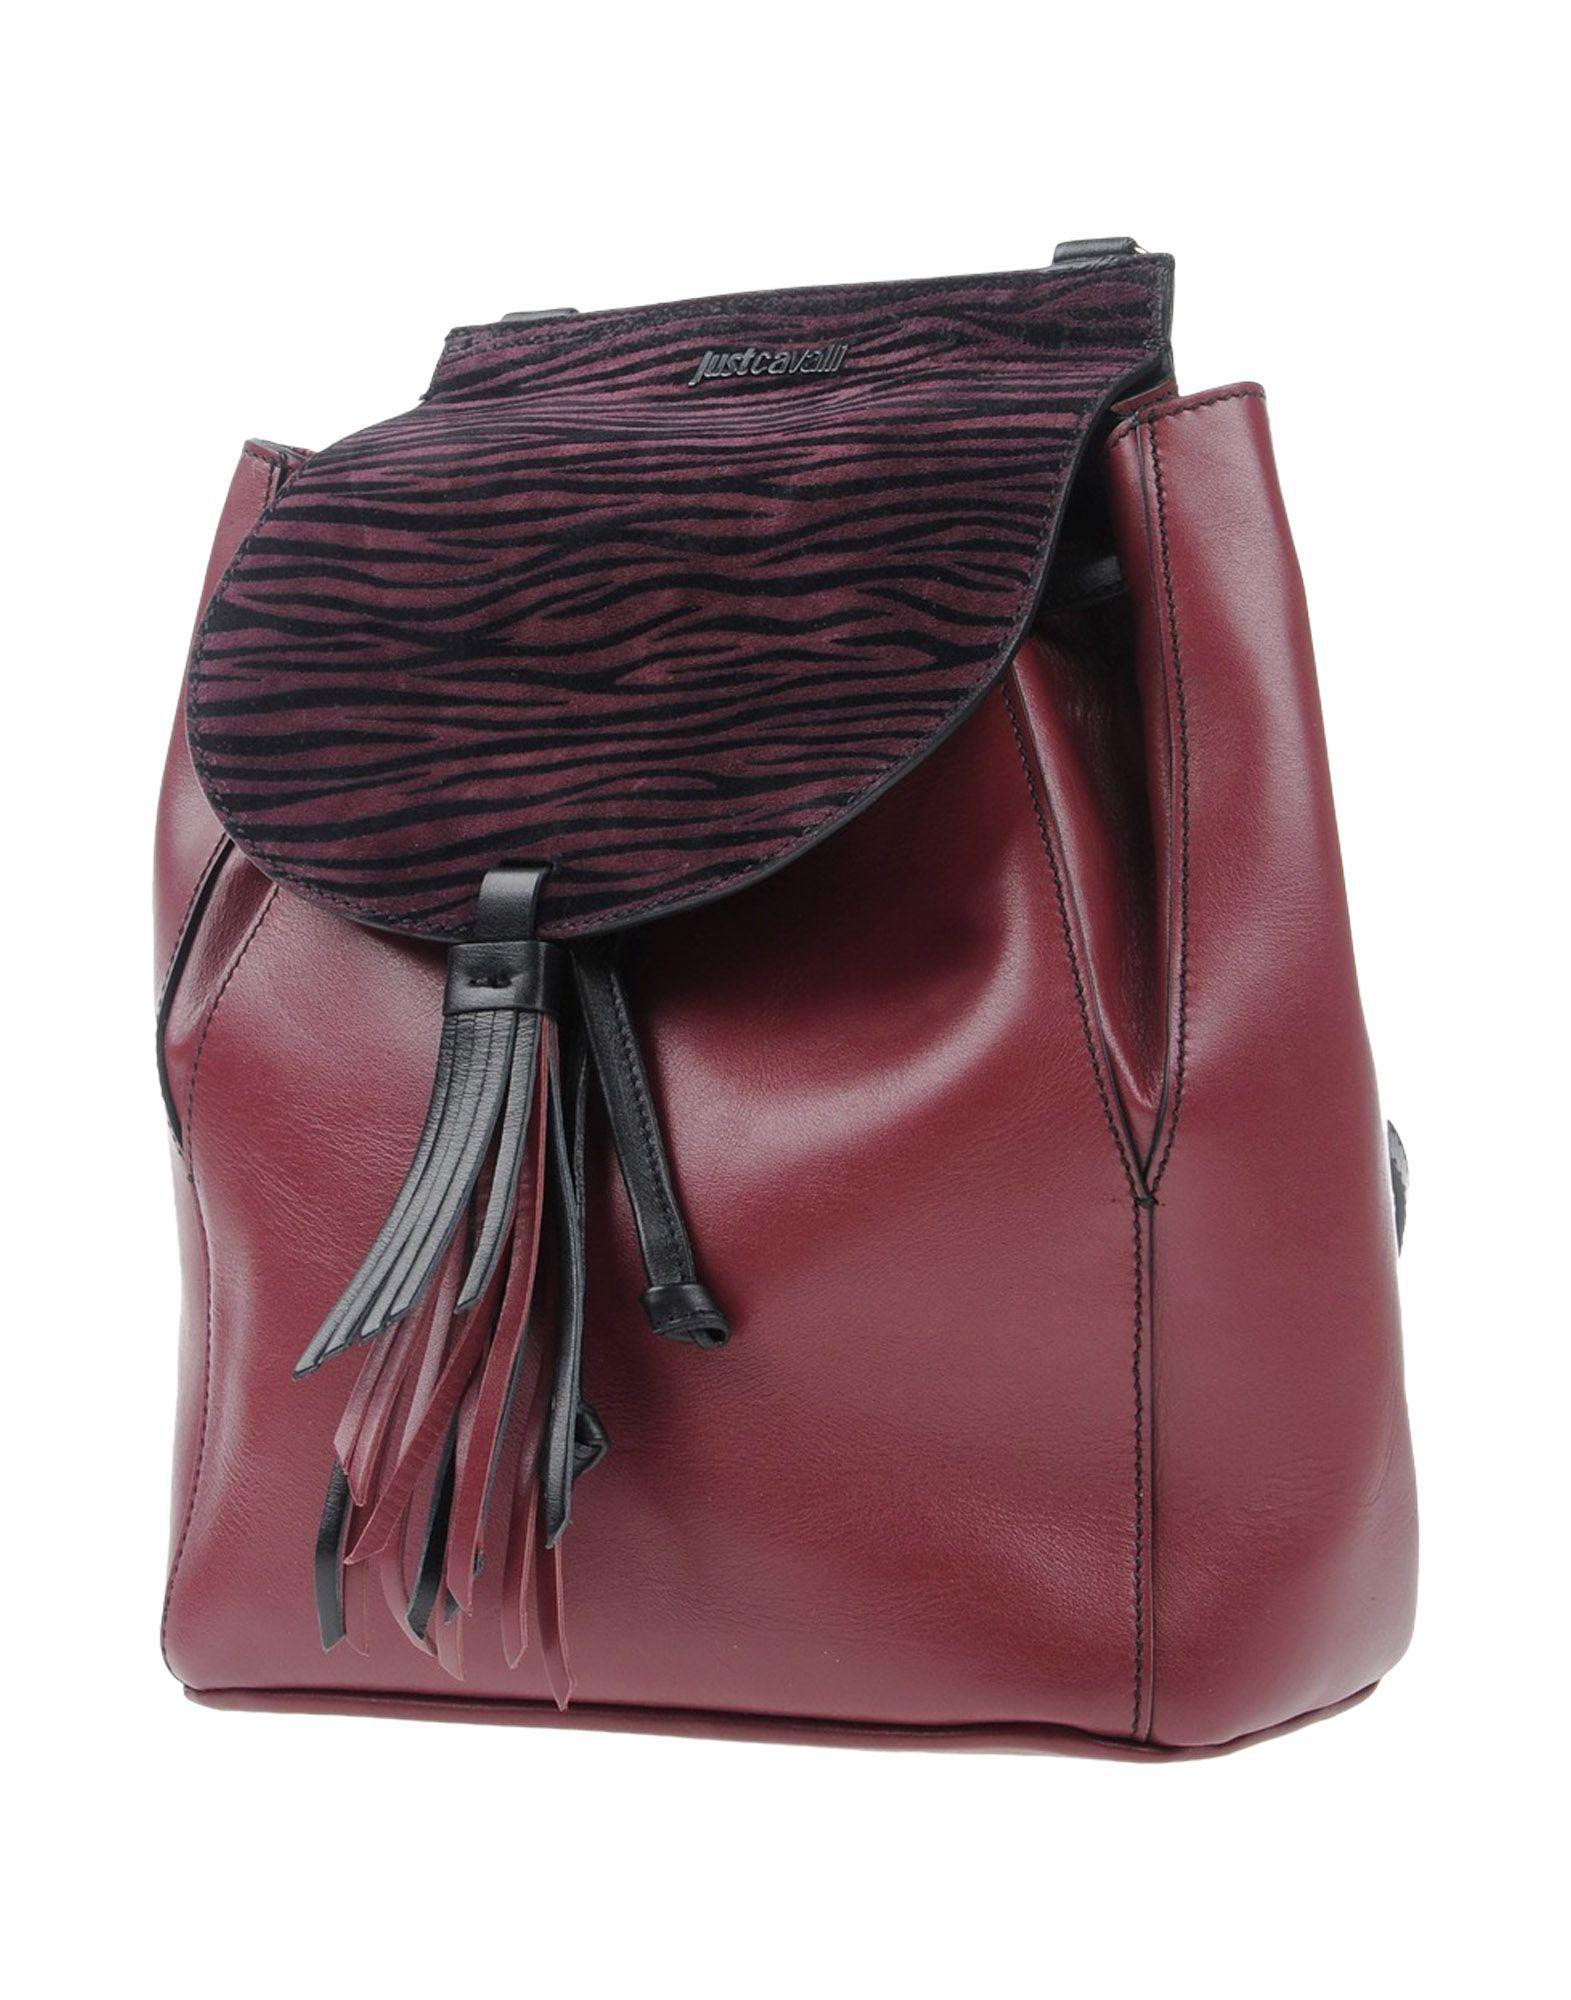 Cheap Monday HANDBAGS - Backpacks & Fanny packs su YOOX.COM UkIX0QrD6